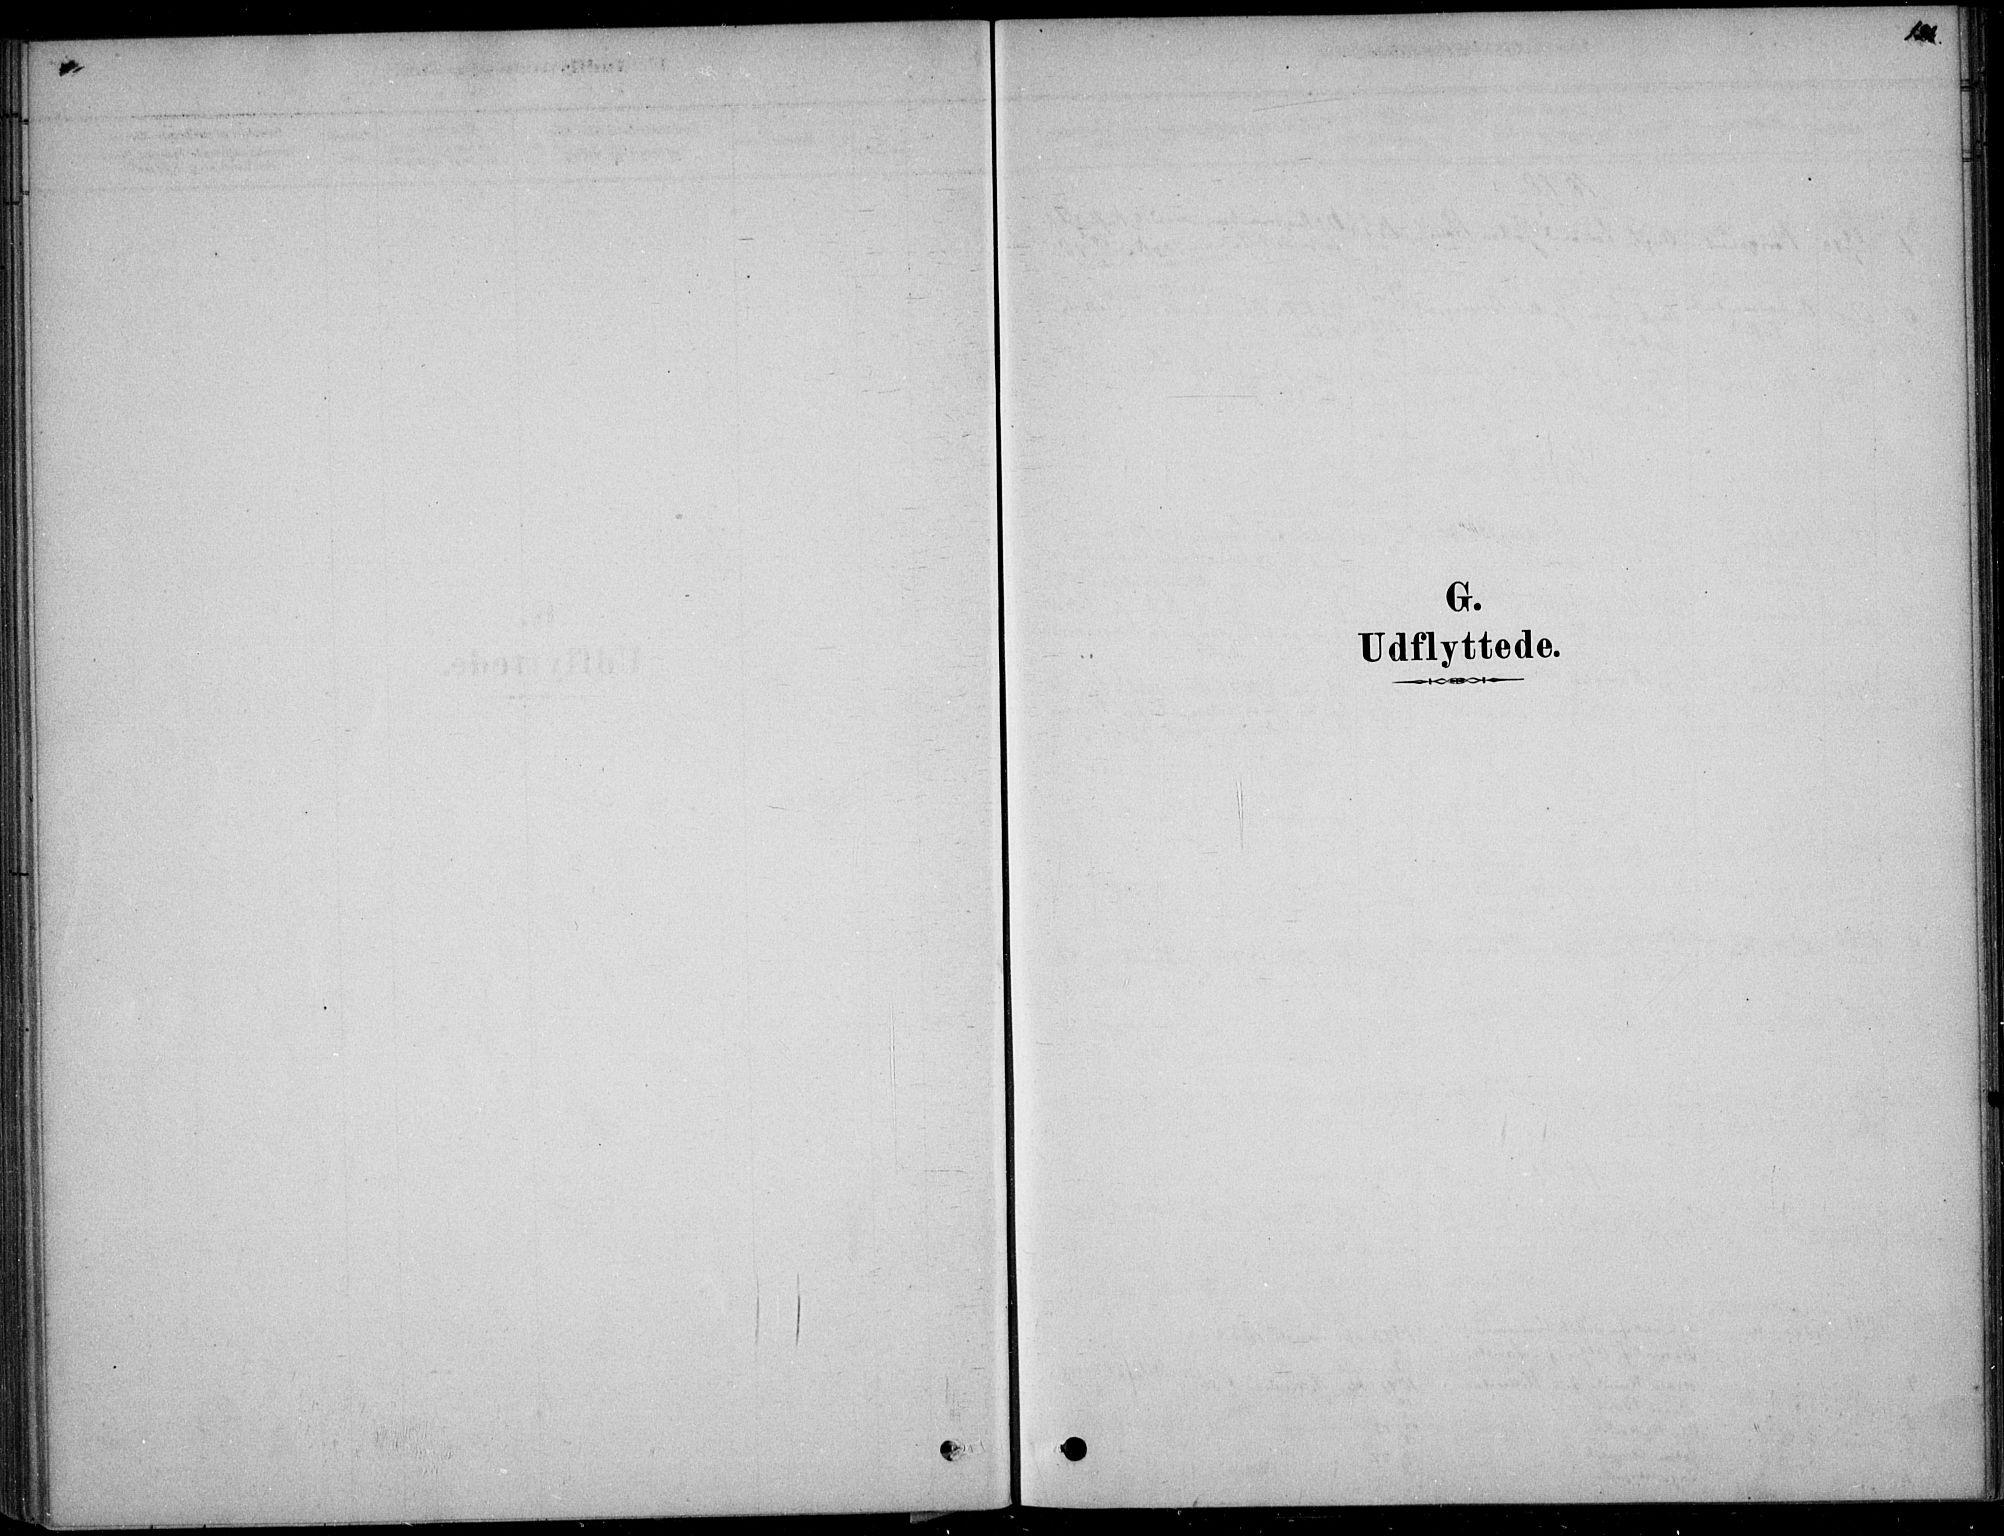 SAKO, Langesund kirkebøker, F/Fa/L0002: Ministerialbok nr. 2, 1878-1892, s. 132